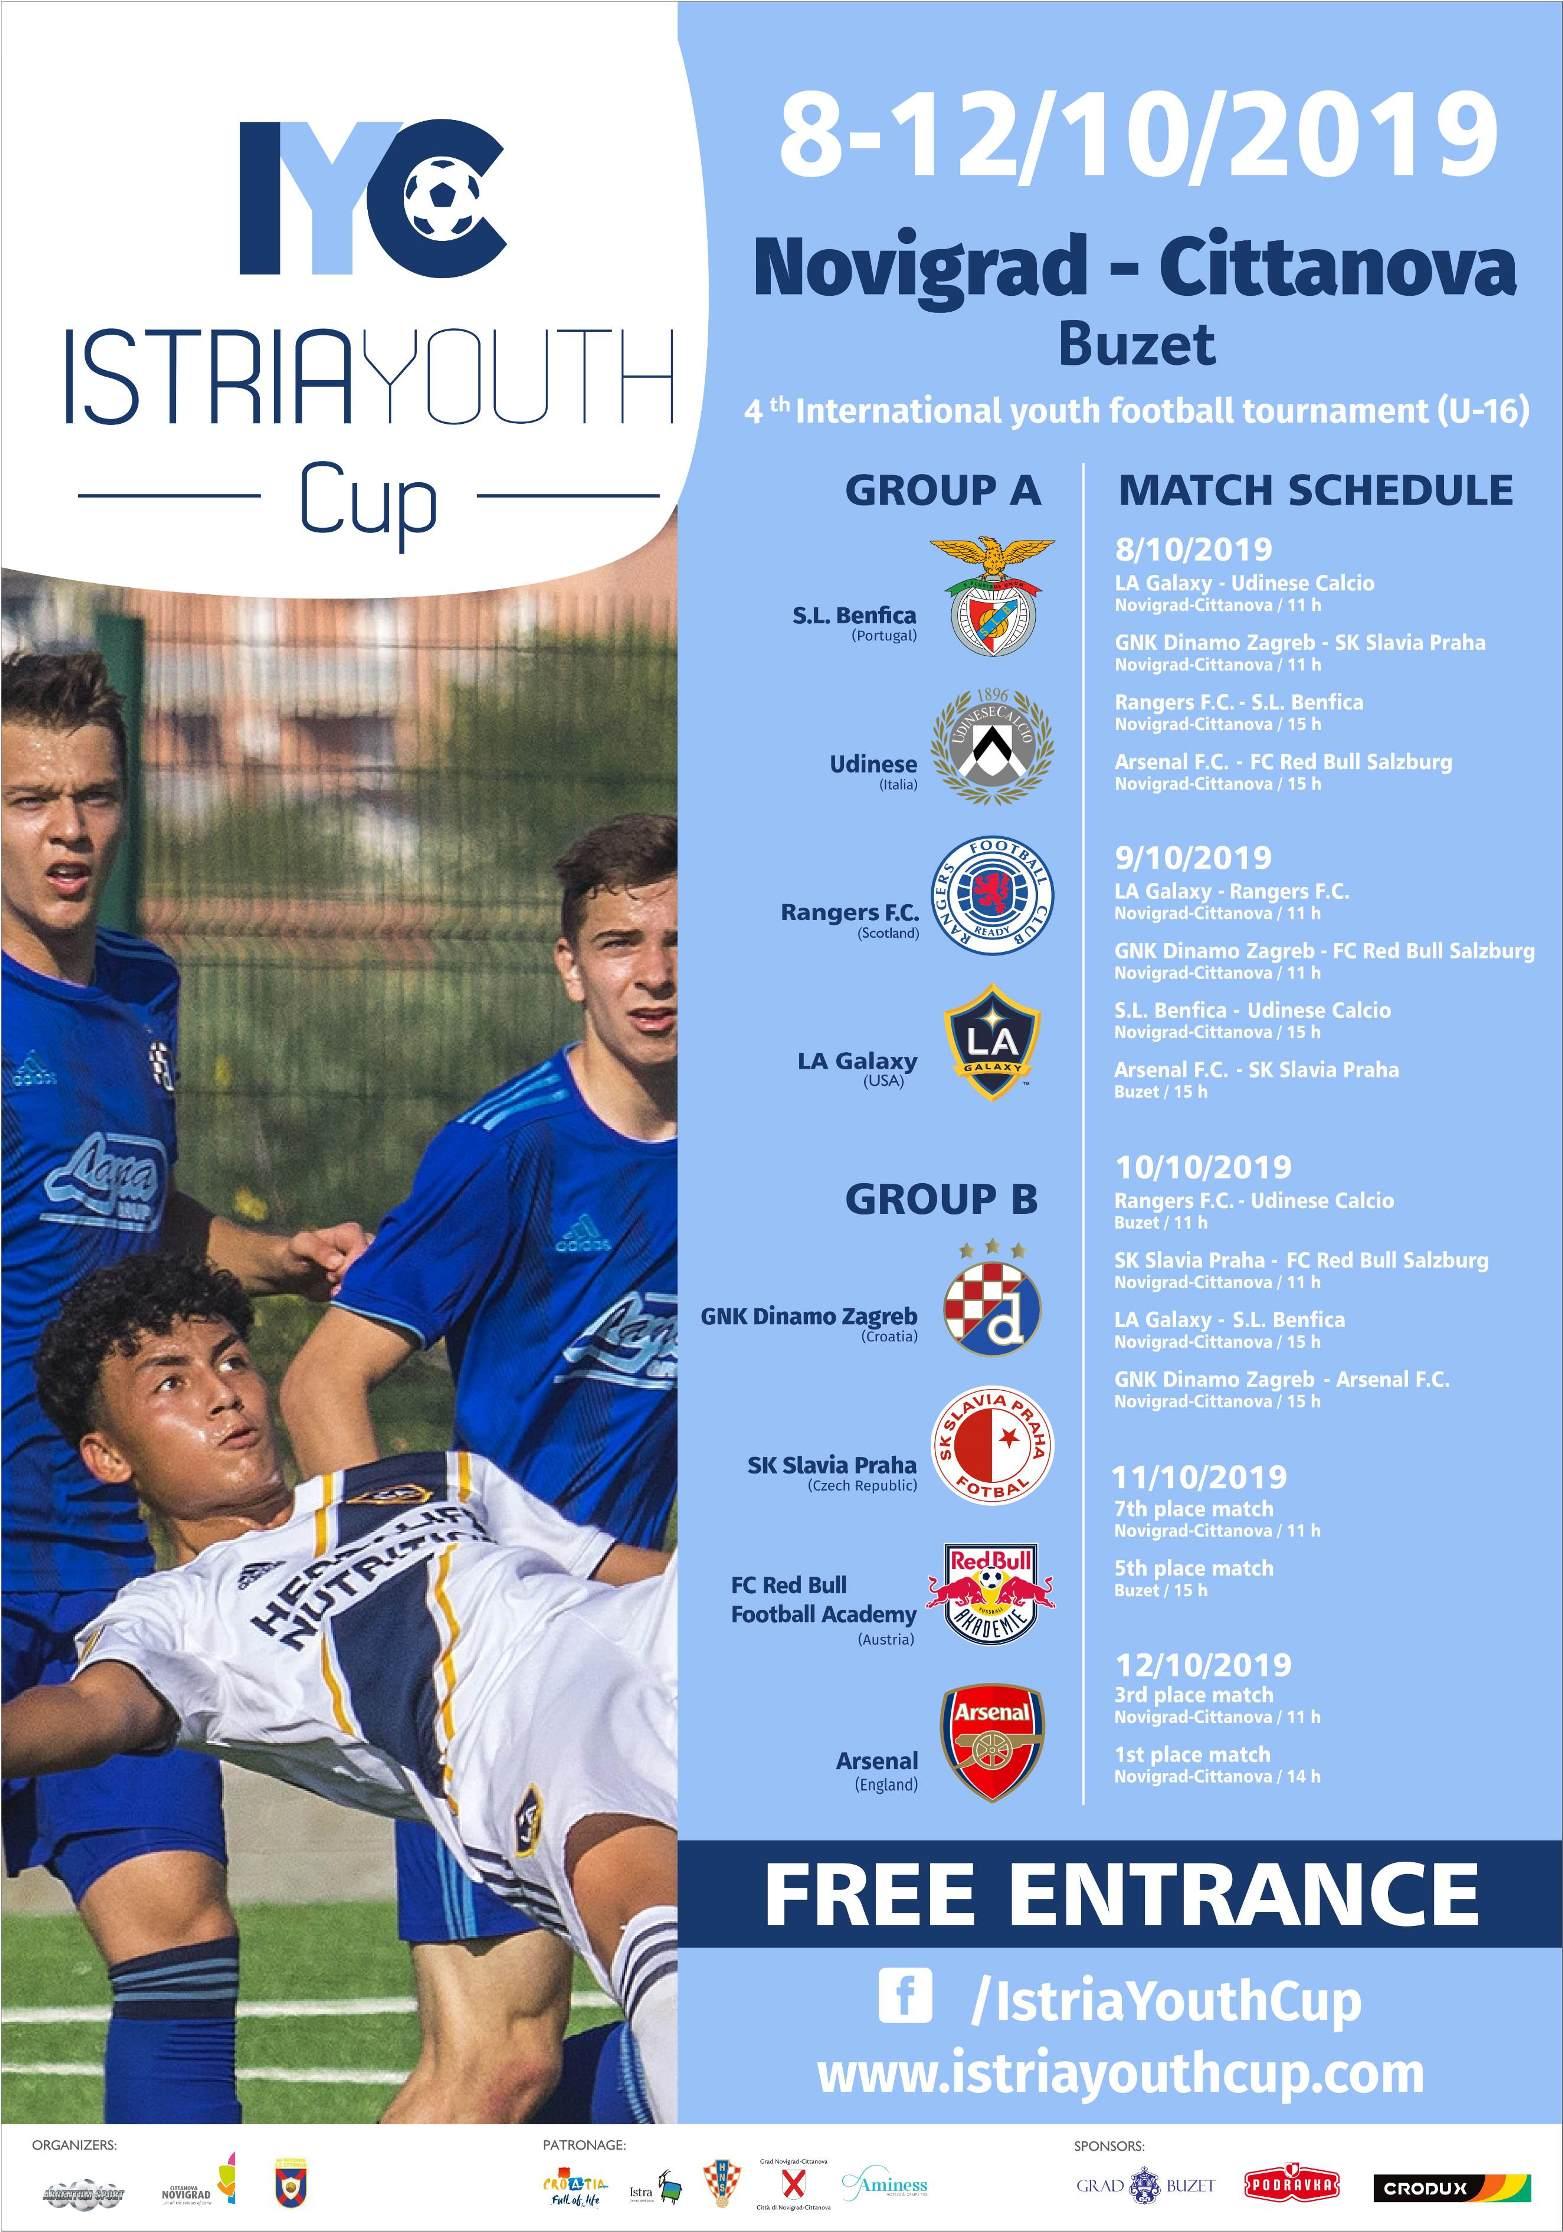 http://www.novigrad.hr/4._meunarodni_nogometni_turnir_u16_istria_youth_cup